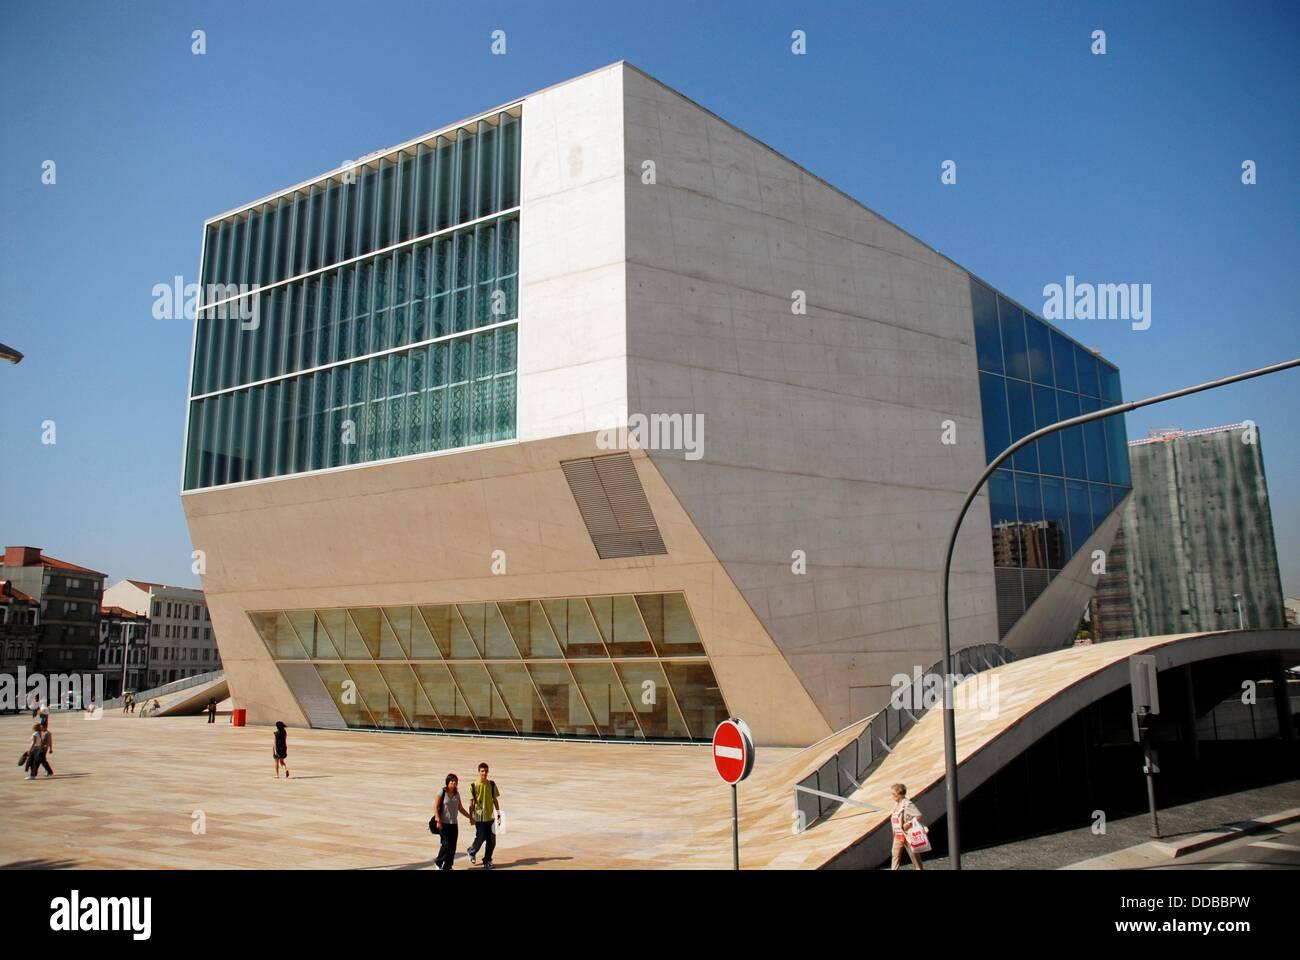 Casa da Musica concert hall by Rem Koolhaas, Porto, Portugal - Stock Image